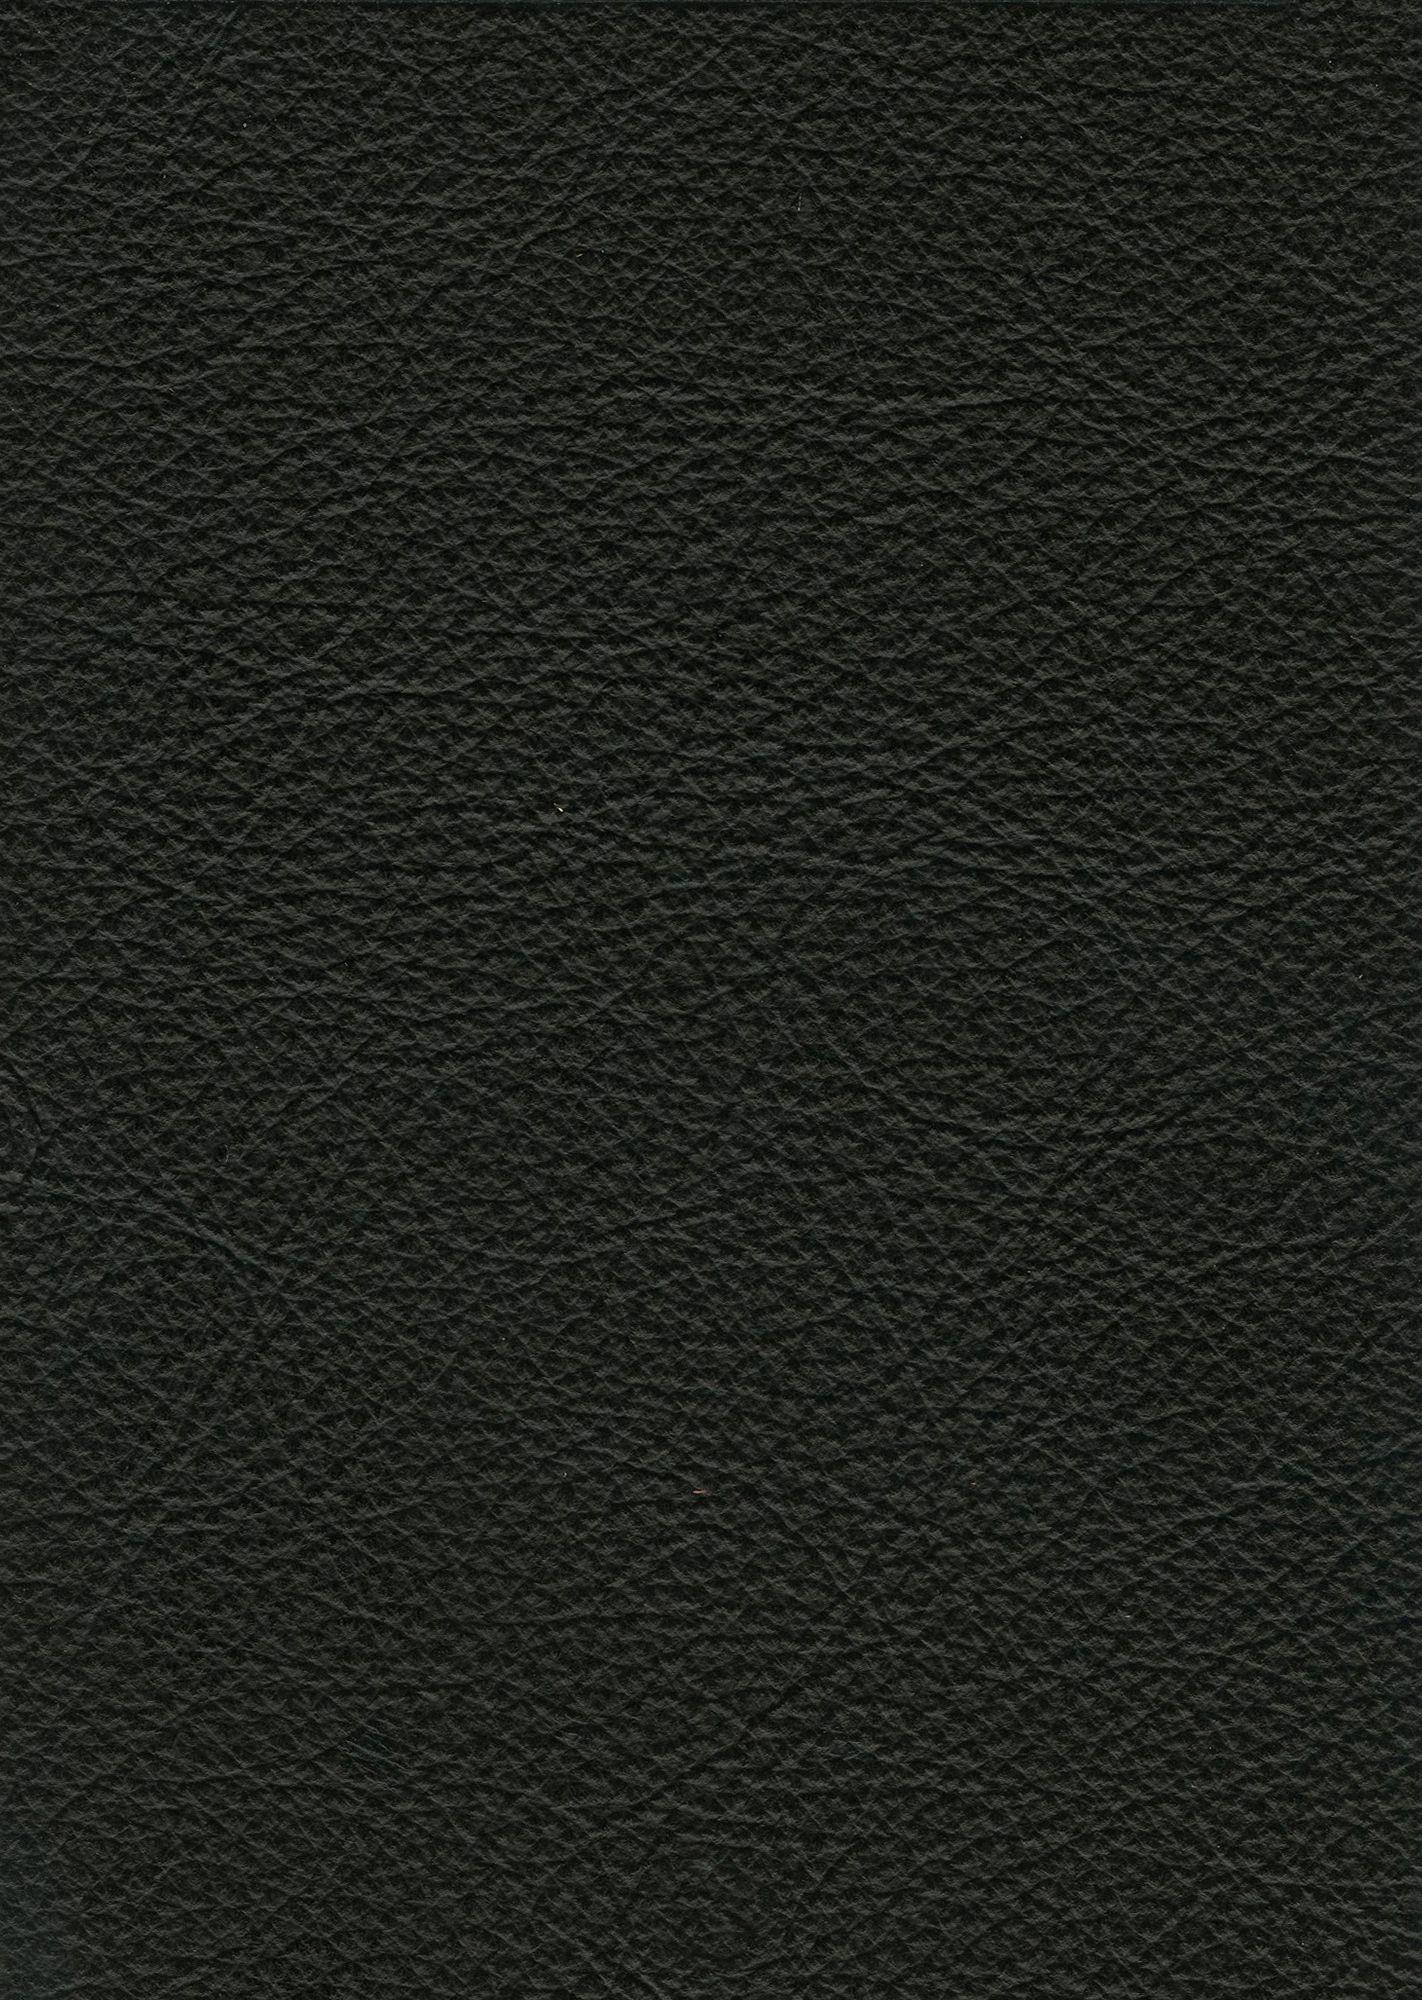 Sherborne Olivia Three Seater Fixed Leather Sofa